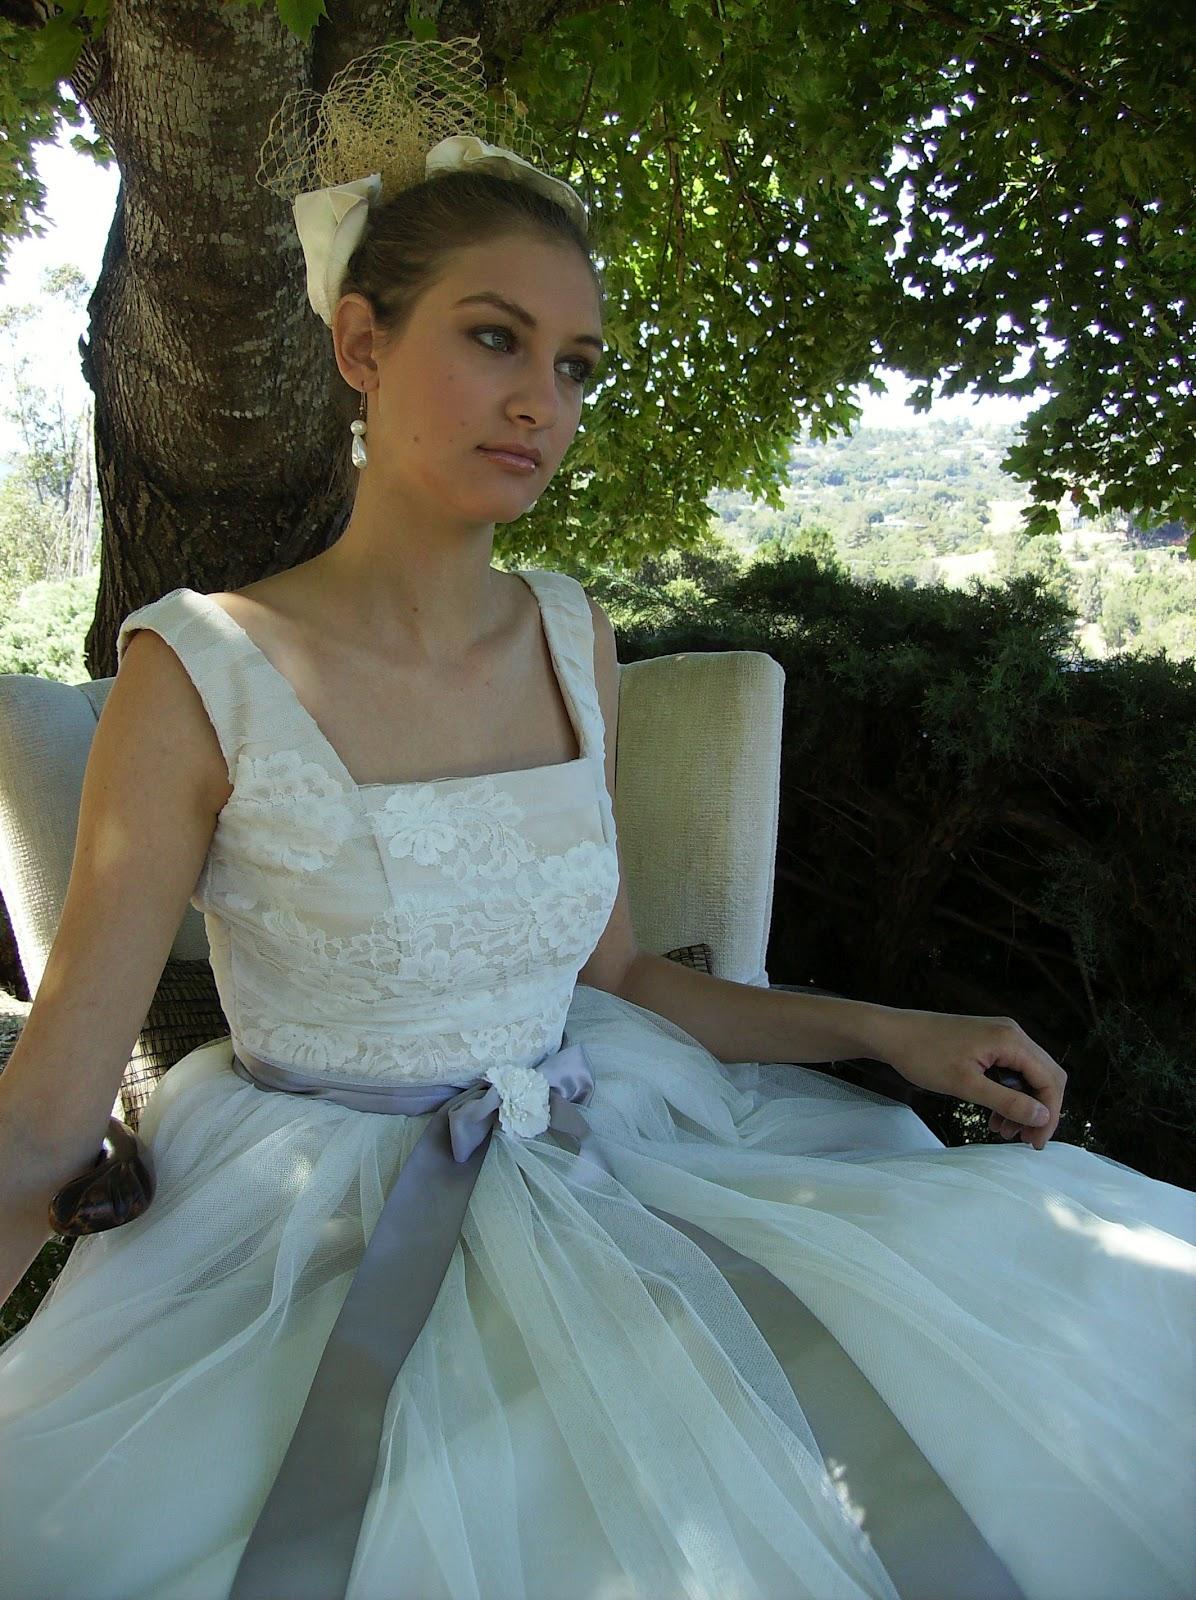 BRIDE CHIC: THE FINE ART OF CHOOSING A NECKLINE